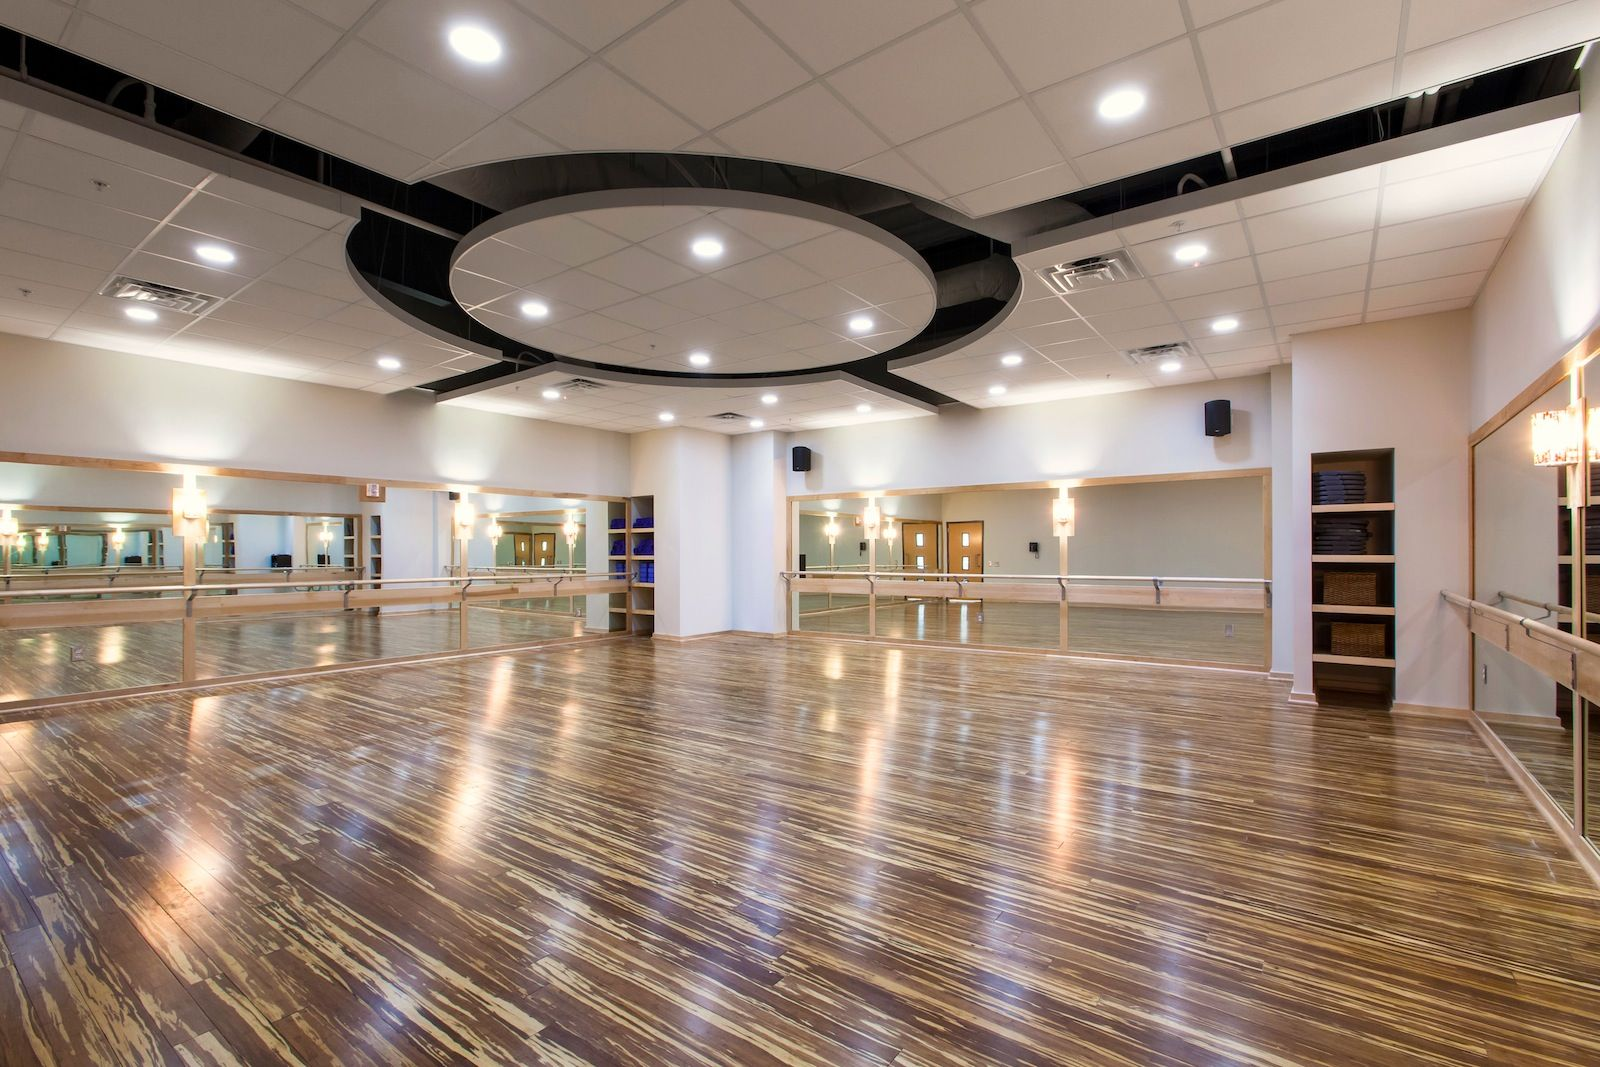 30 Best Yoga Studios In Seattle Https://trytopic.com/Yoga